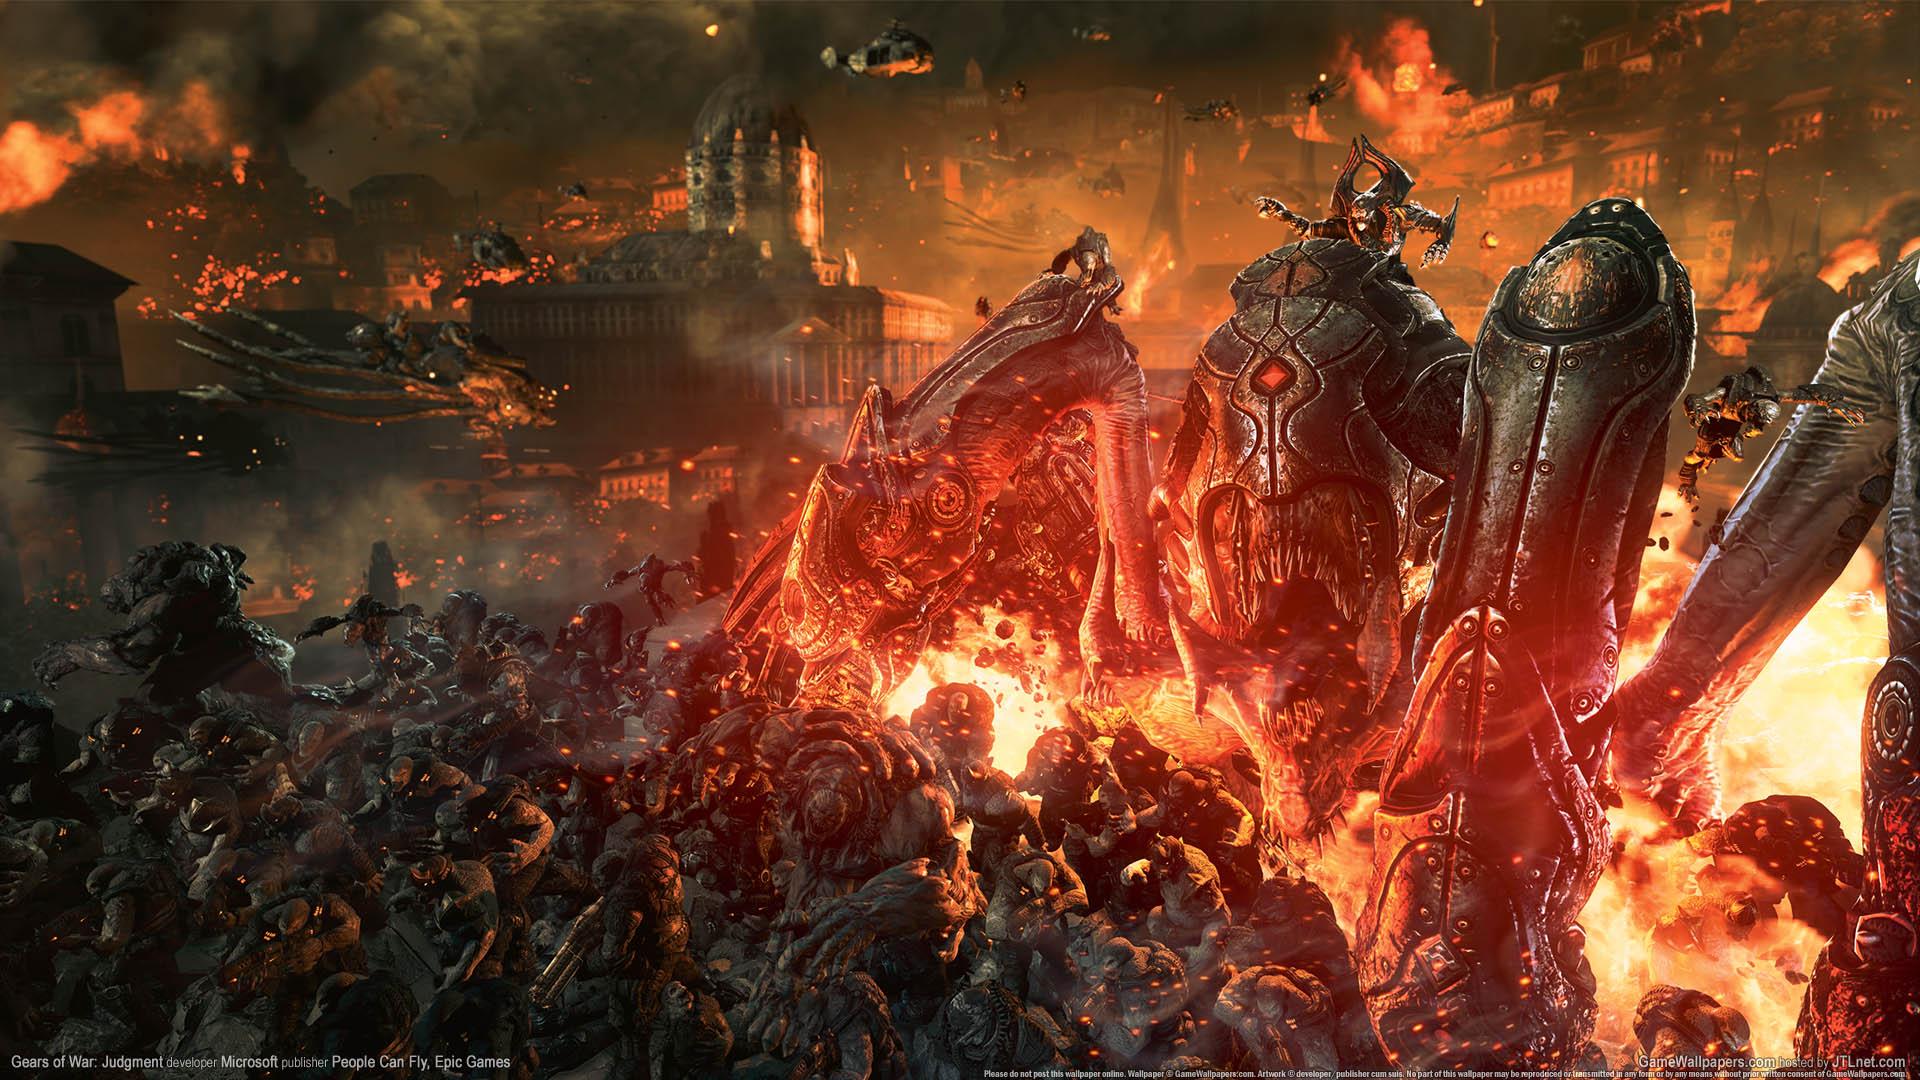 Gears Of War Judgment Wallpaper 04 1920x1080